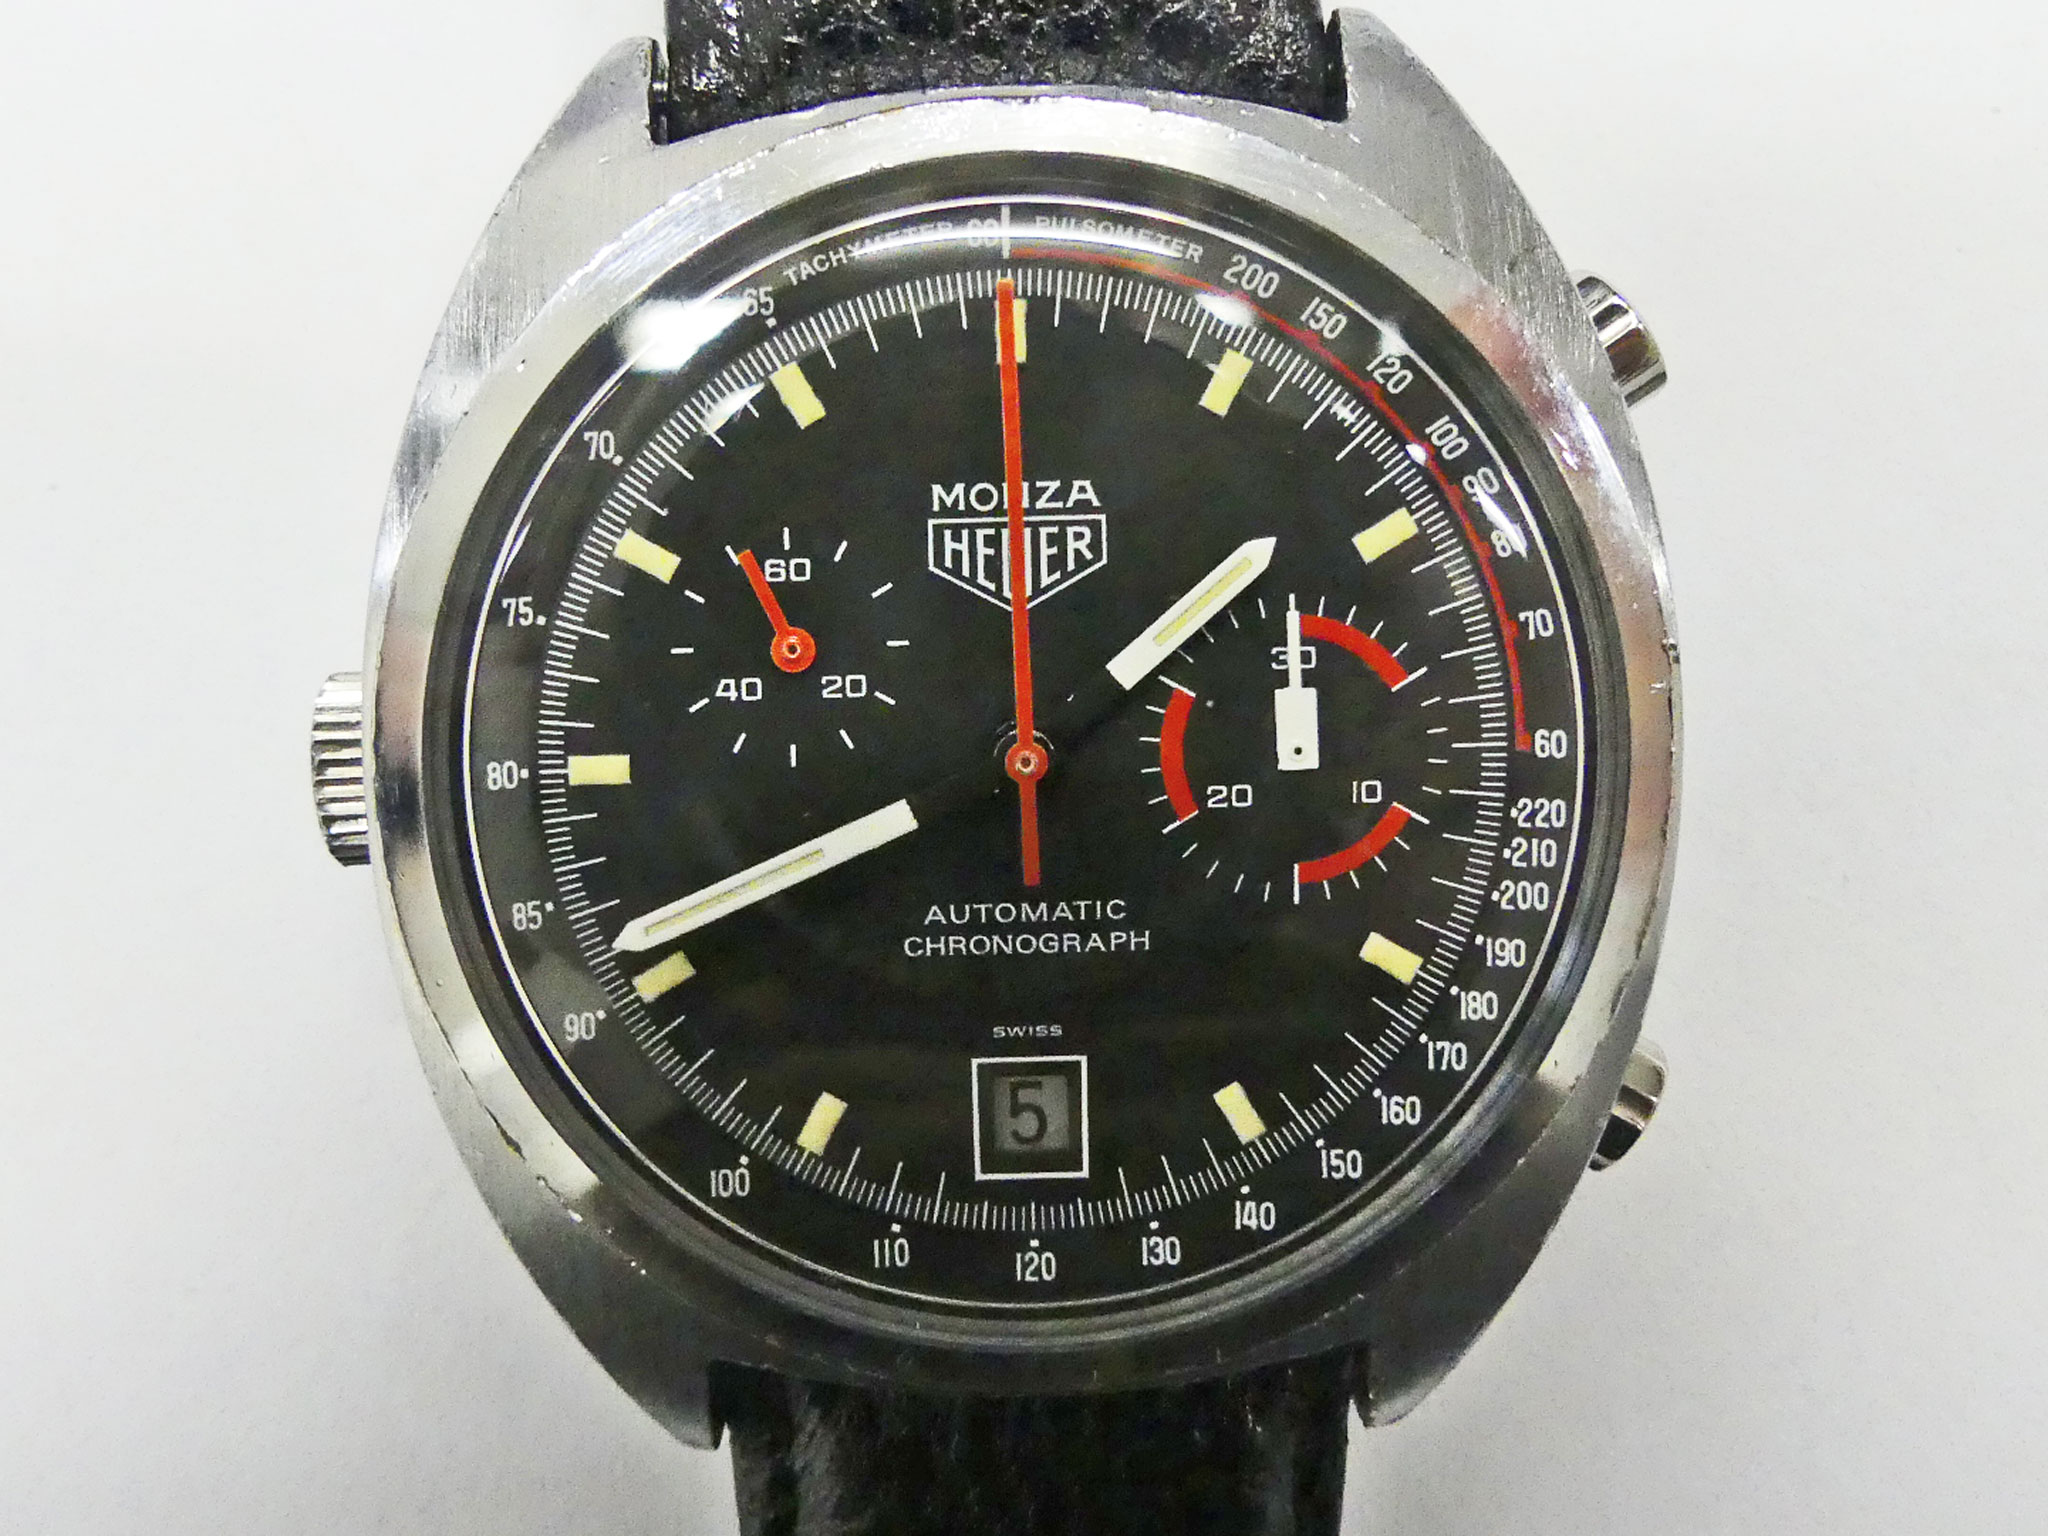 Heuer Monza Niki Lauda Ref 150511 Kaufen